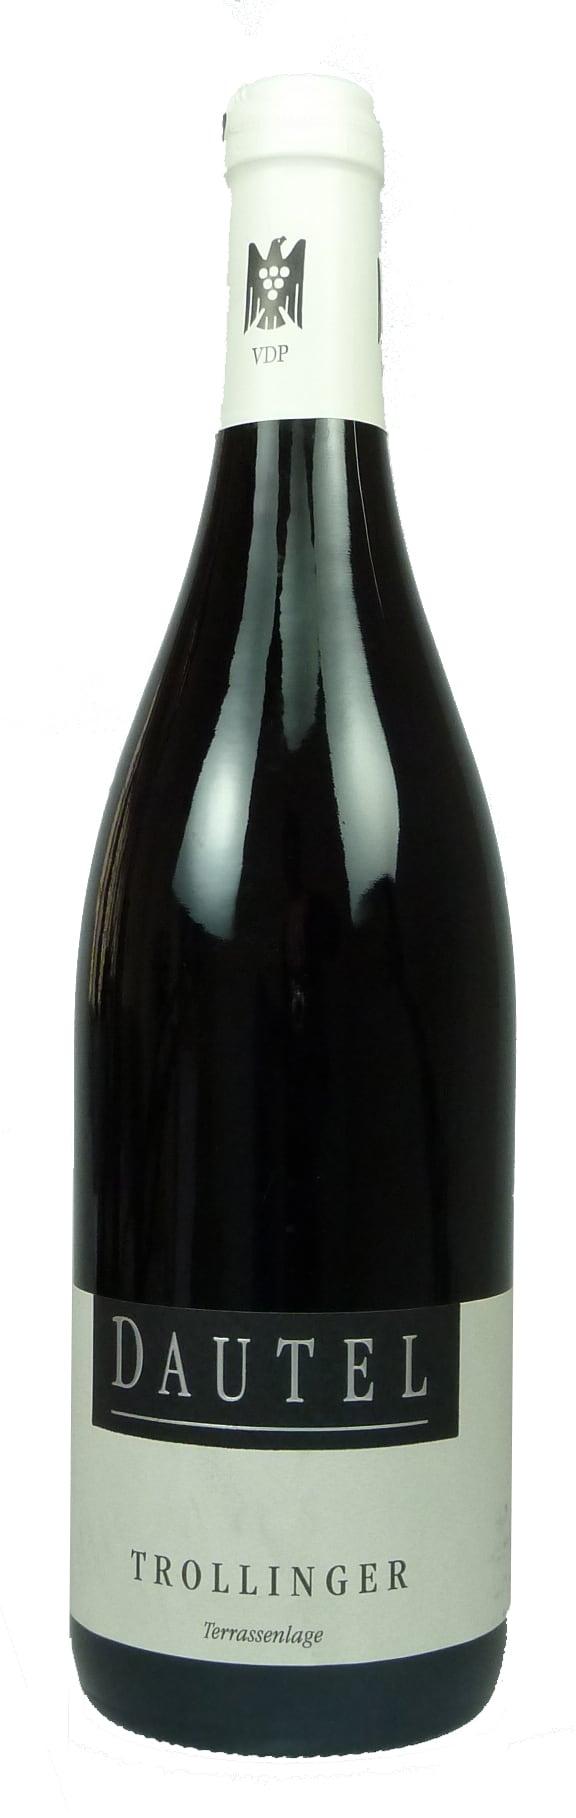 Trollinger Qualitätswein trocken 2017